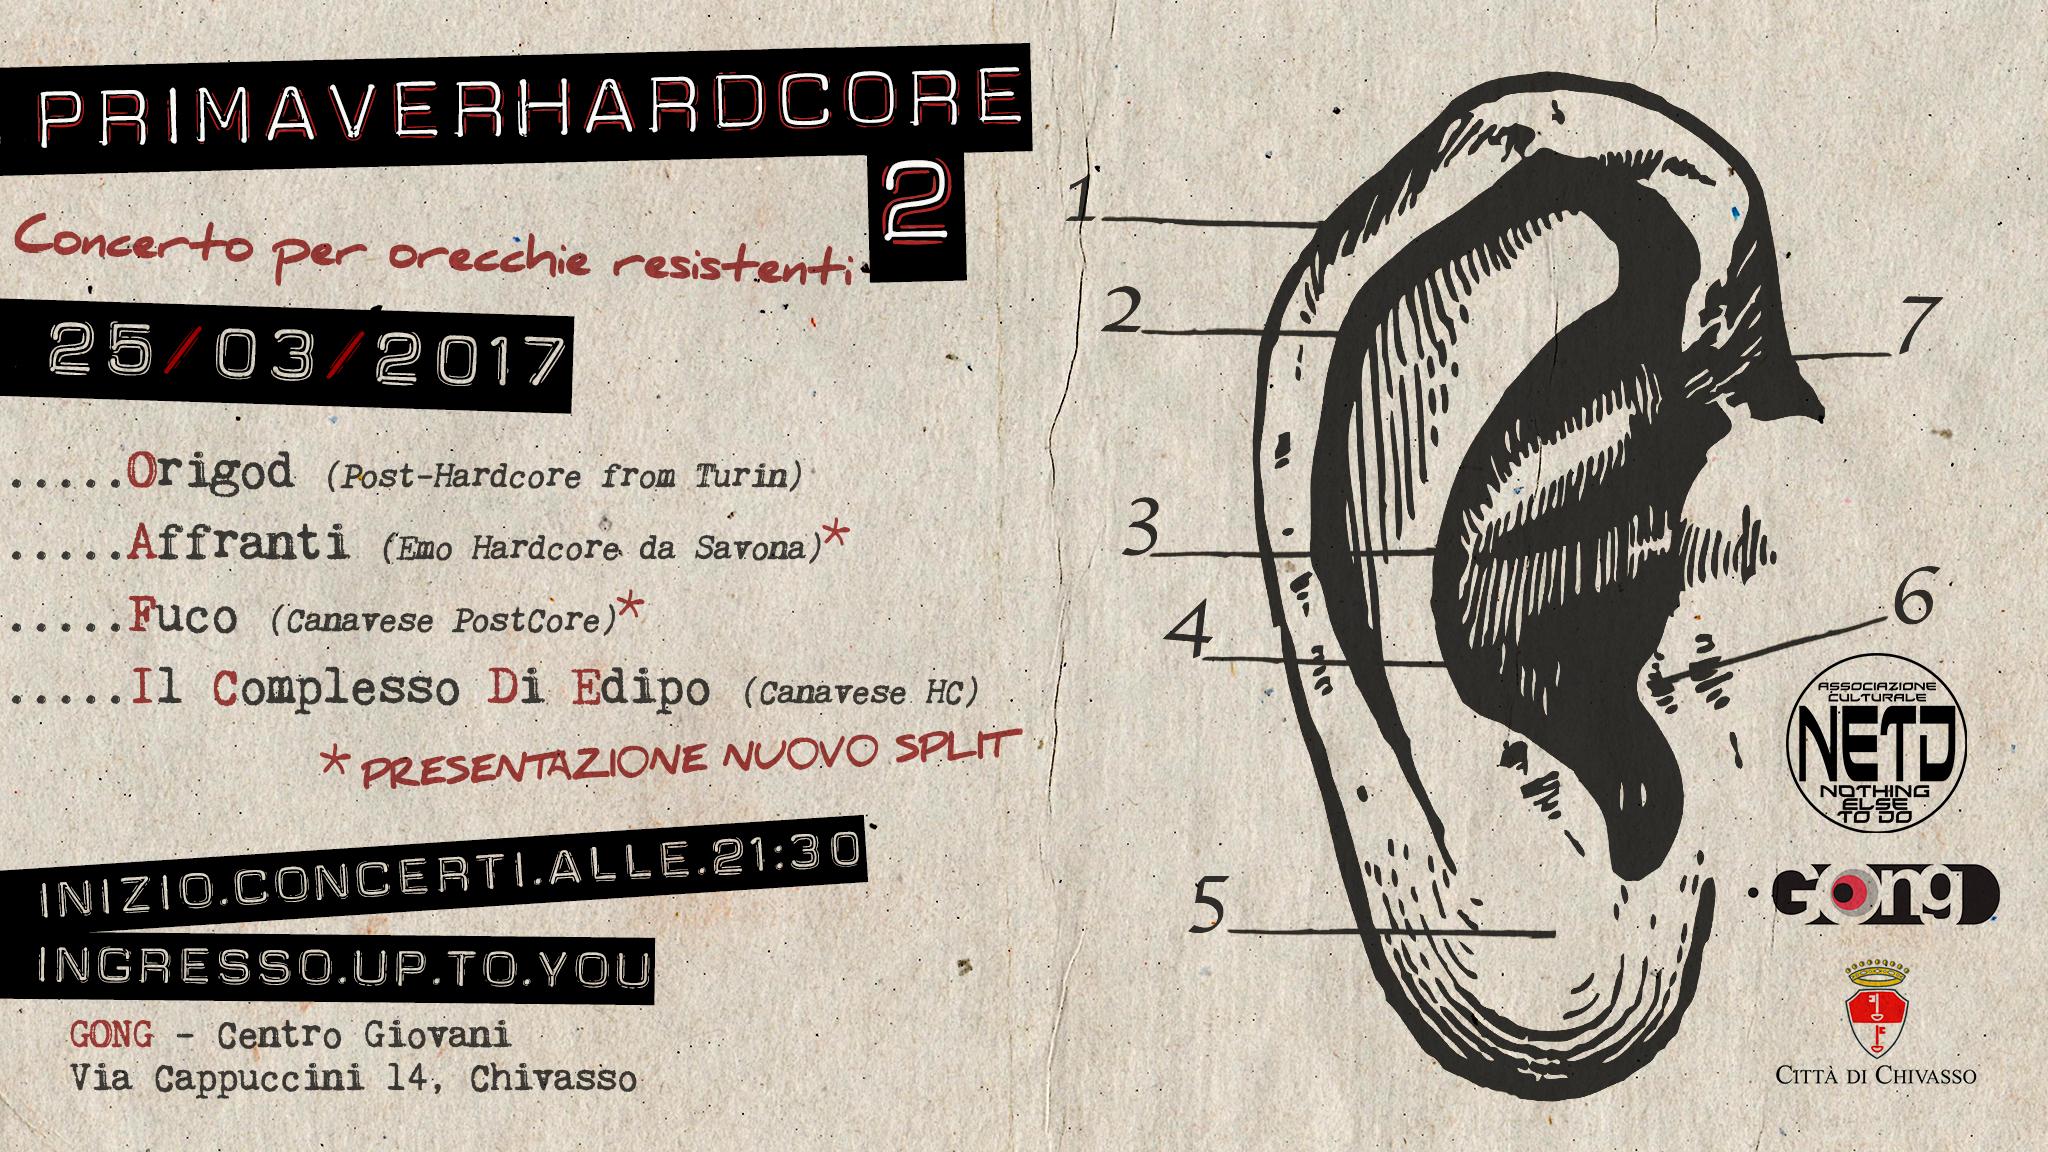 PRIMAVERHARDCORE 2